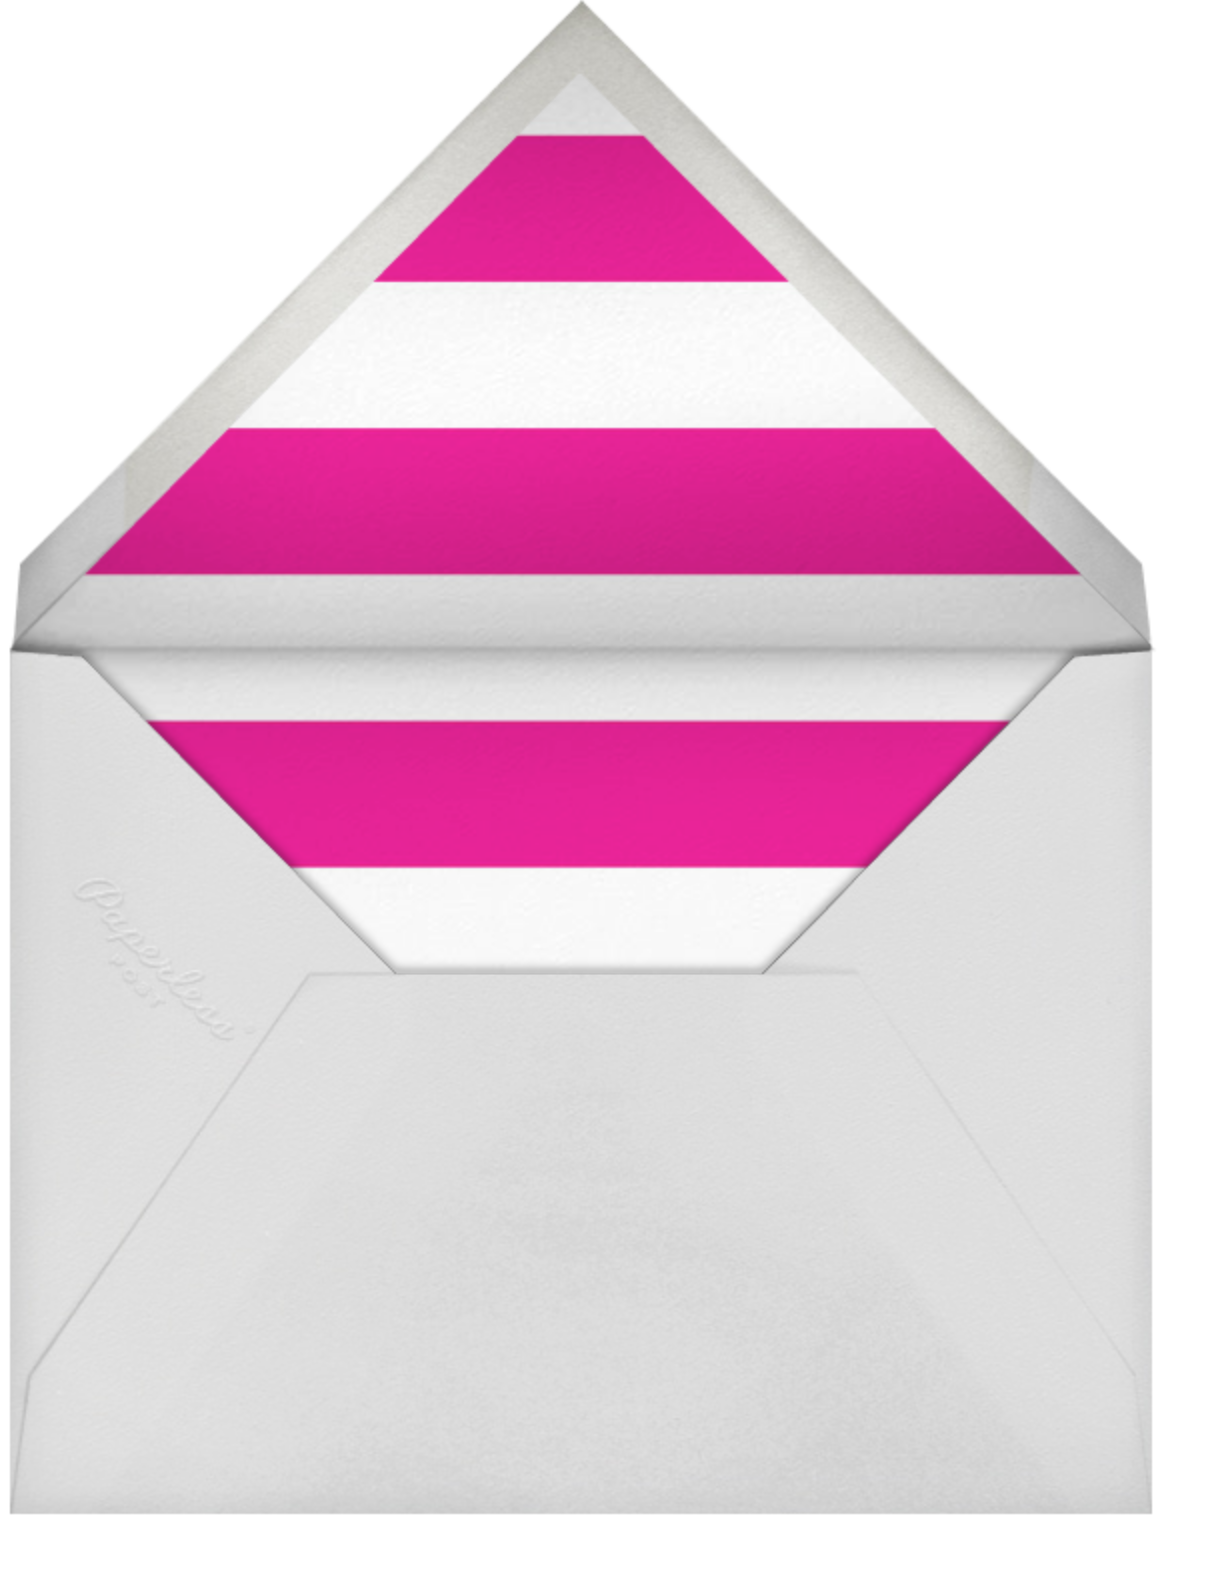 Name Tag - Pink - kate spade new york - kate spade new york - envelope back